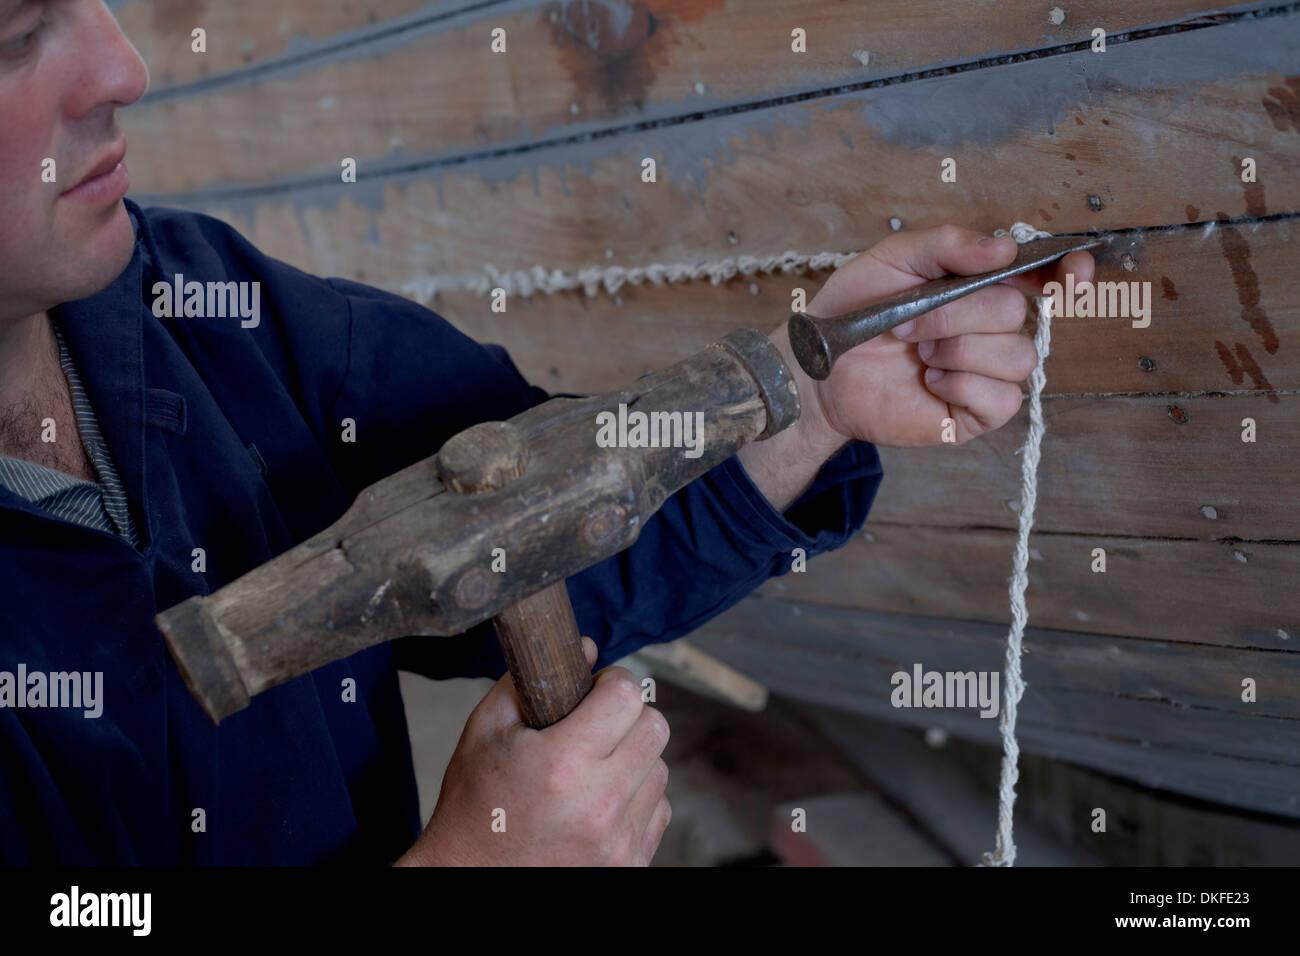 Man hammering string into boat in workshop Stock Photo